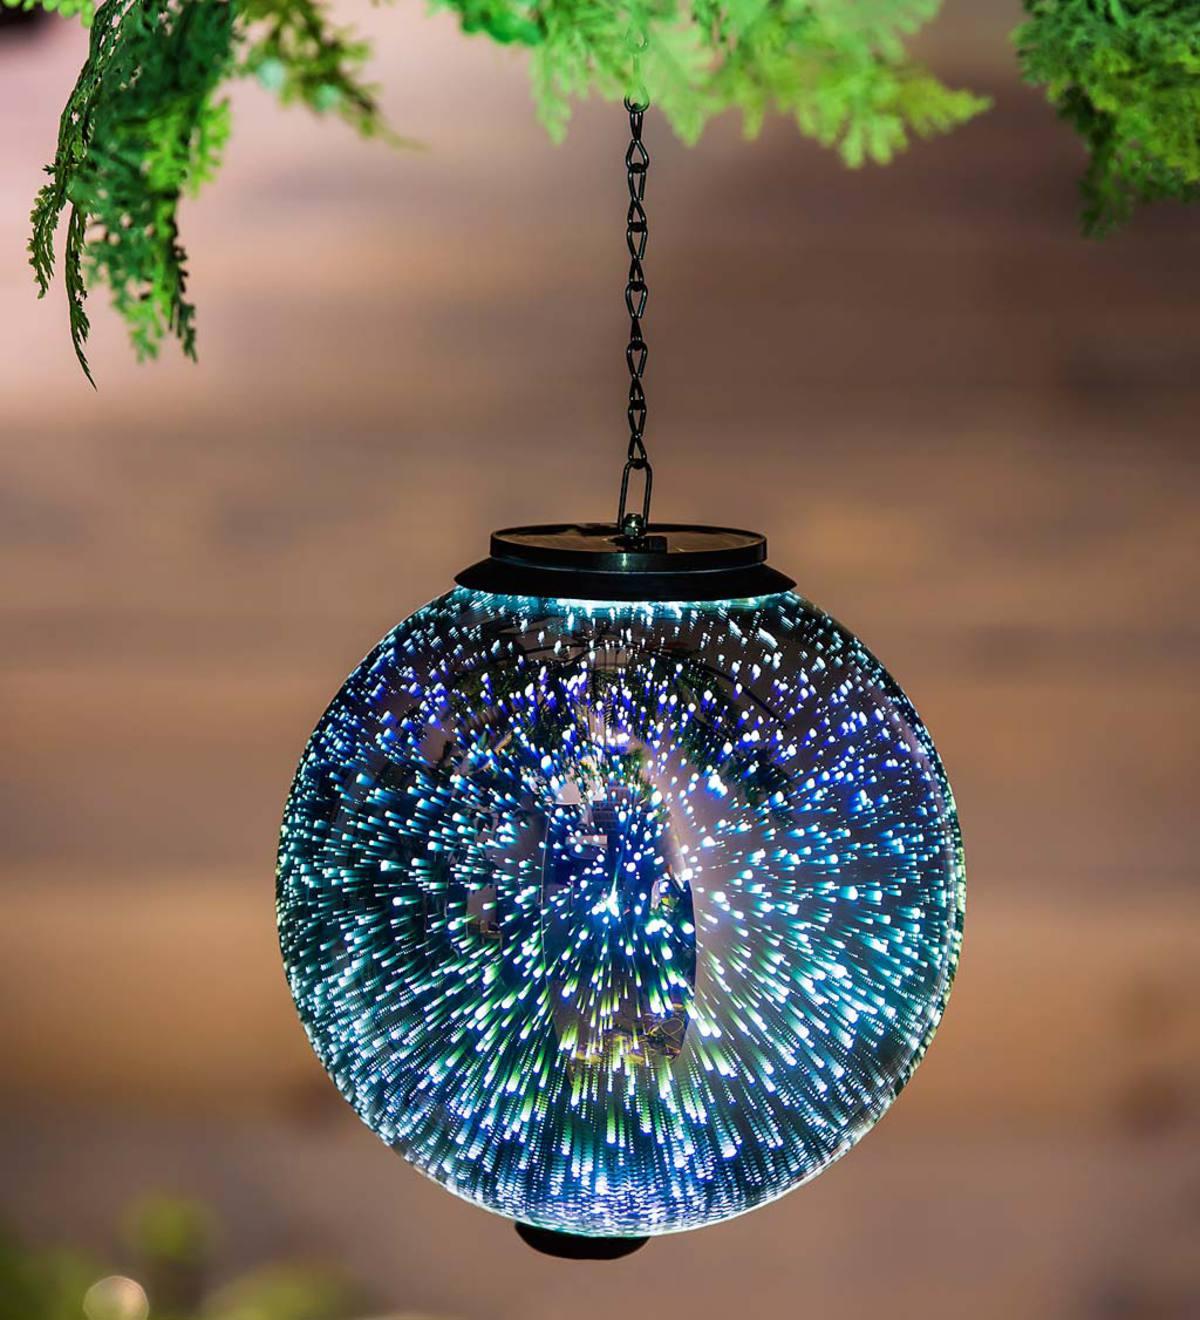 Stargazing Solar Orb | Lighted Garden Accents | Garden Décor by Type ...